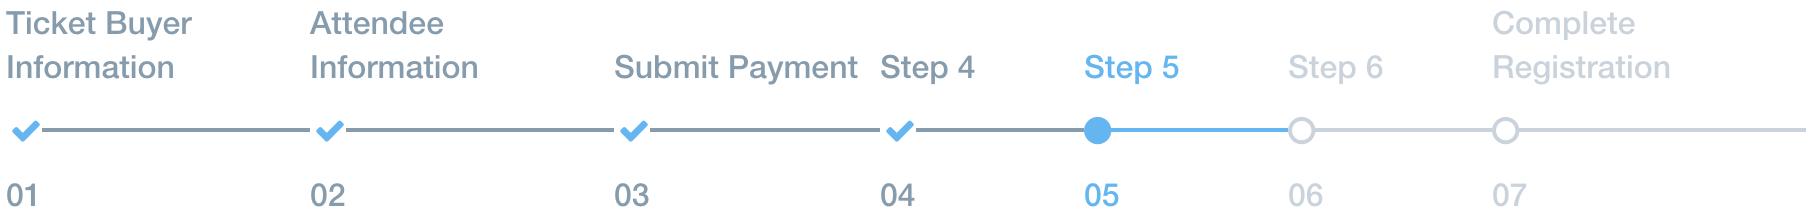 determiate progress bar or wizard